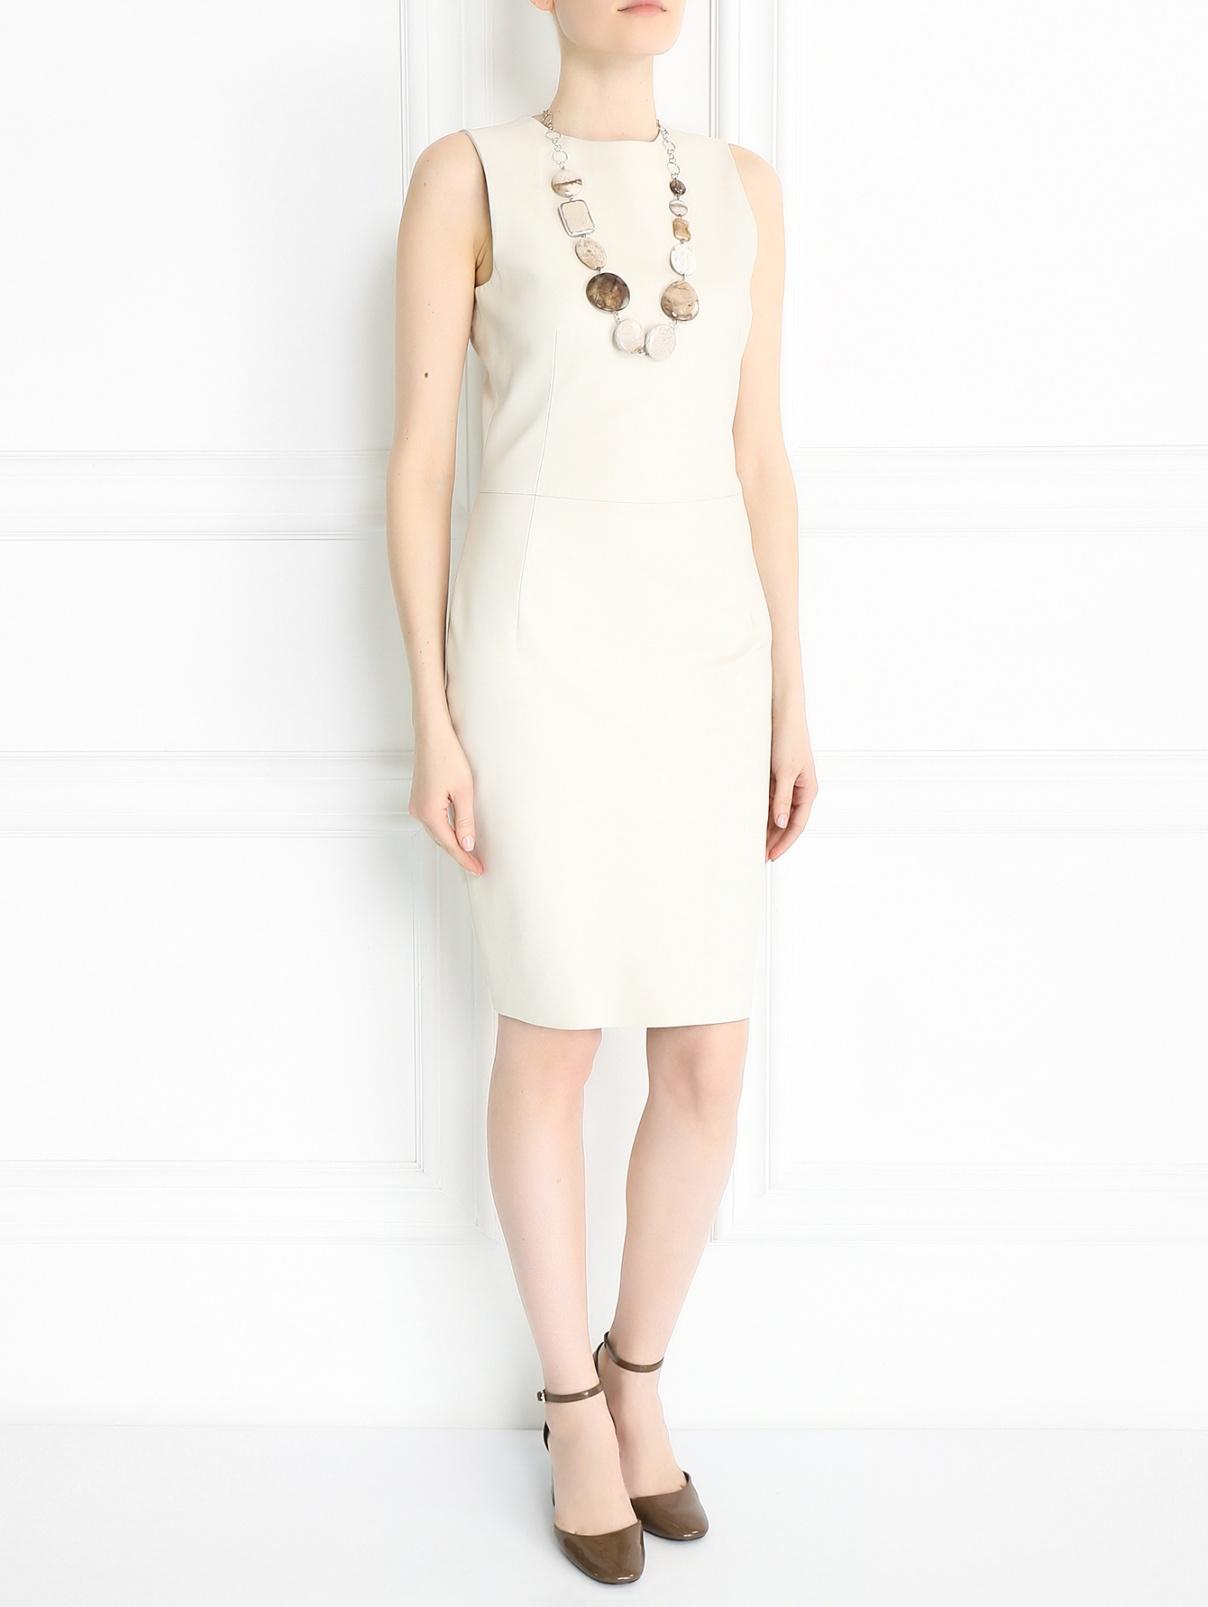 Платье-футляр из кожи без рукавов Yves Salomon  –  Модель Общий вид  – Цвет:  Бежевый